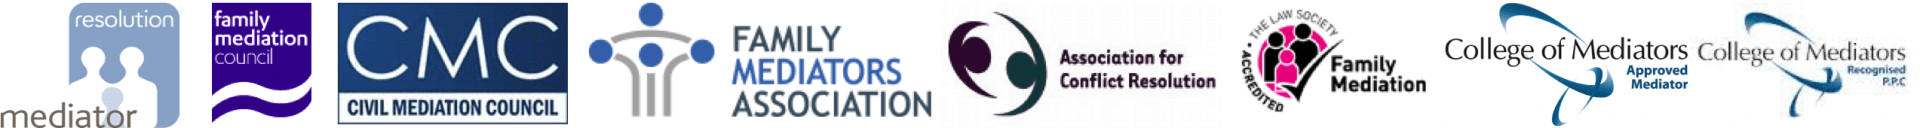 mediation accreditations